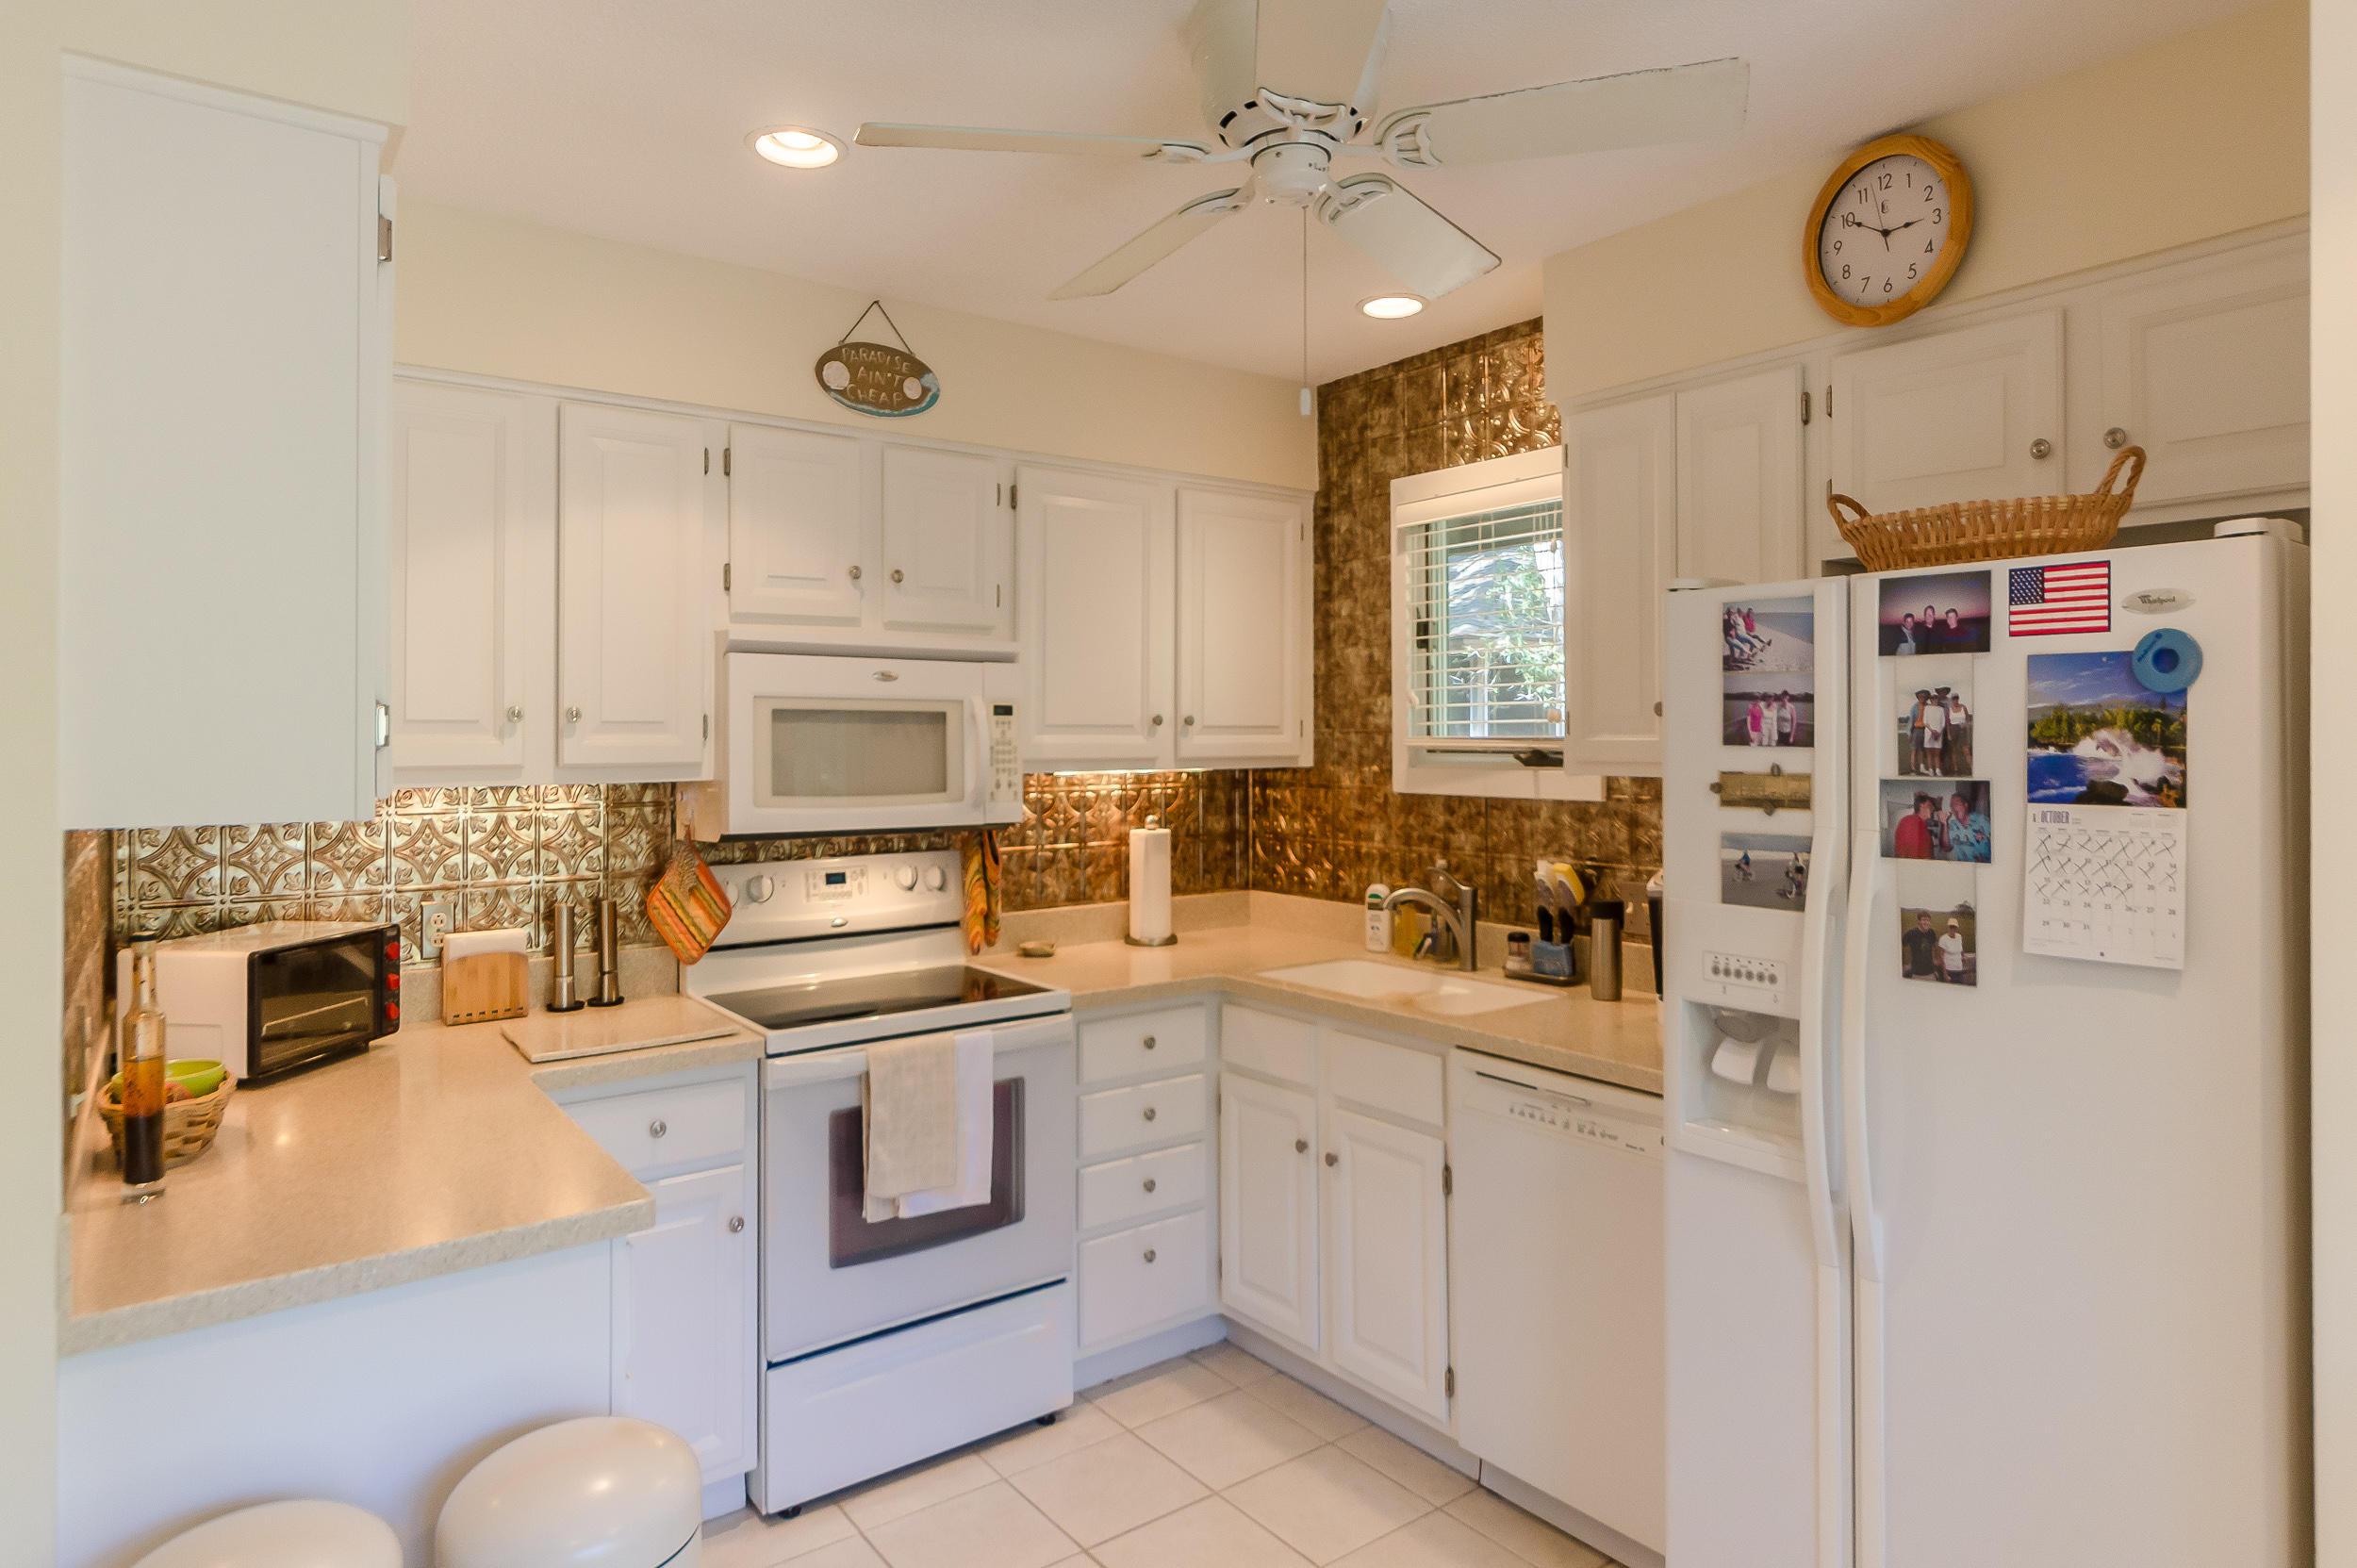 Kiawah Island Homes For Sale - 4186 Bald Pate, Kiawah Island, SC - 12